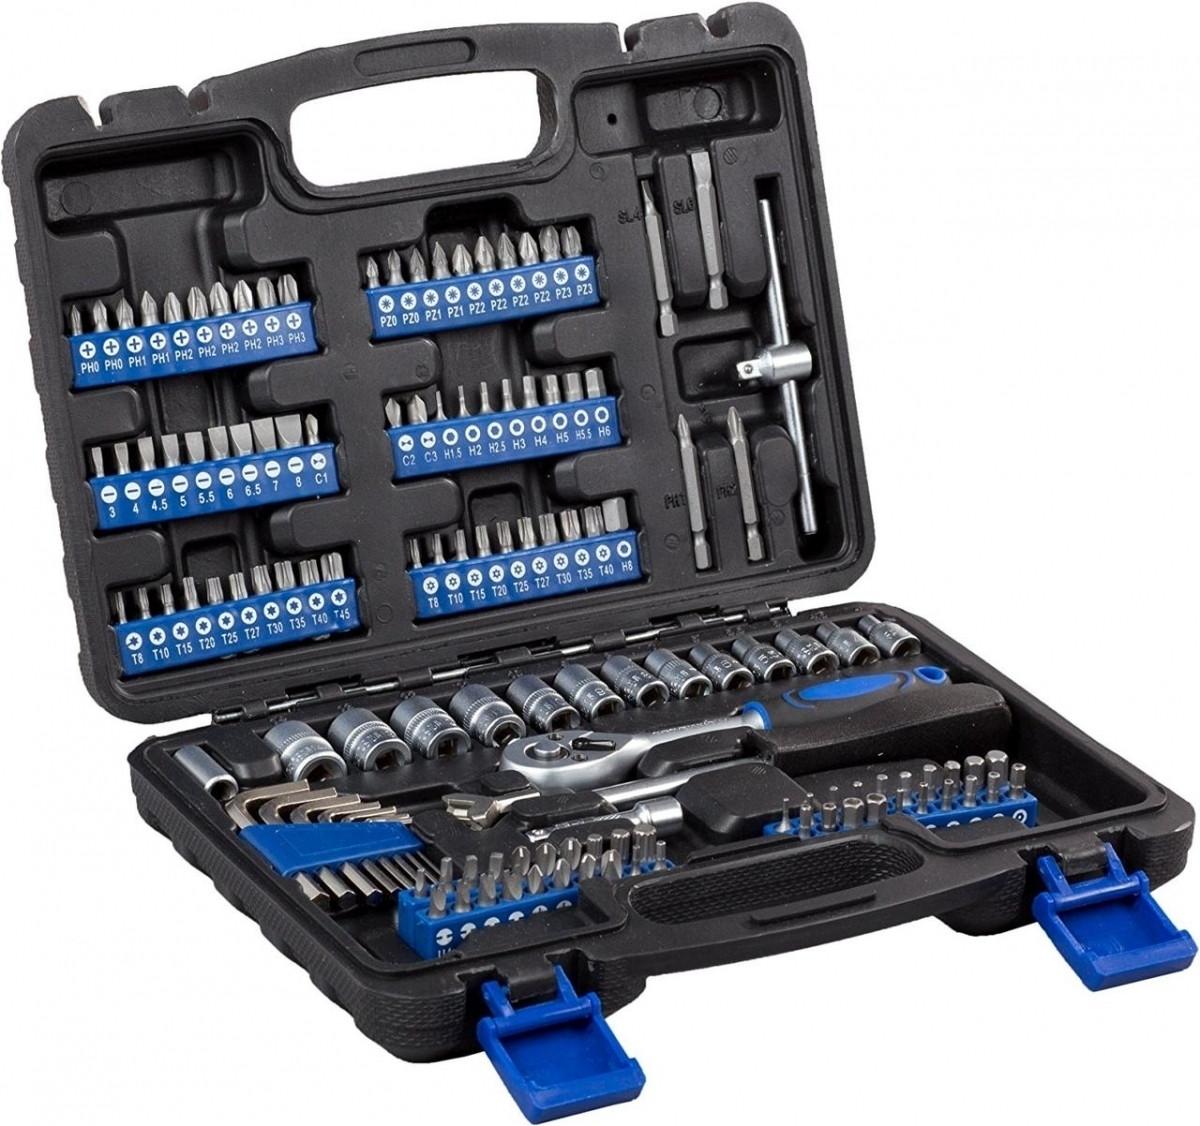 Набор инструментов Atrox AY0416 1/4 132 предмета